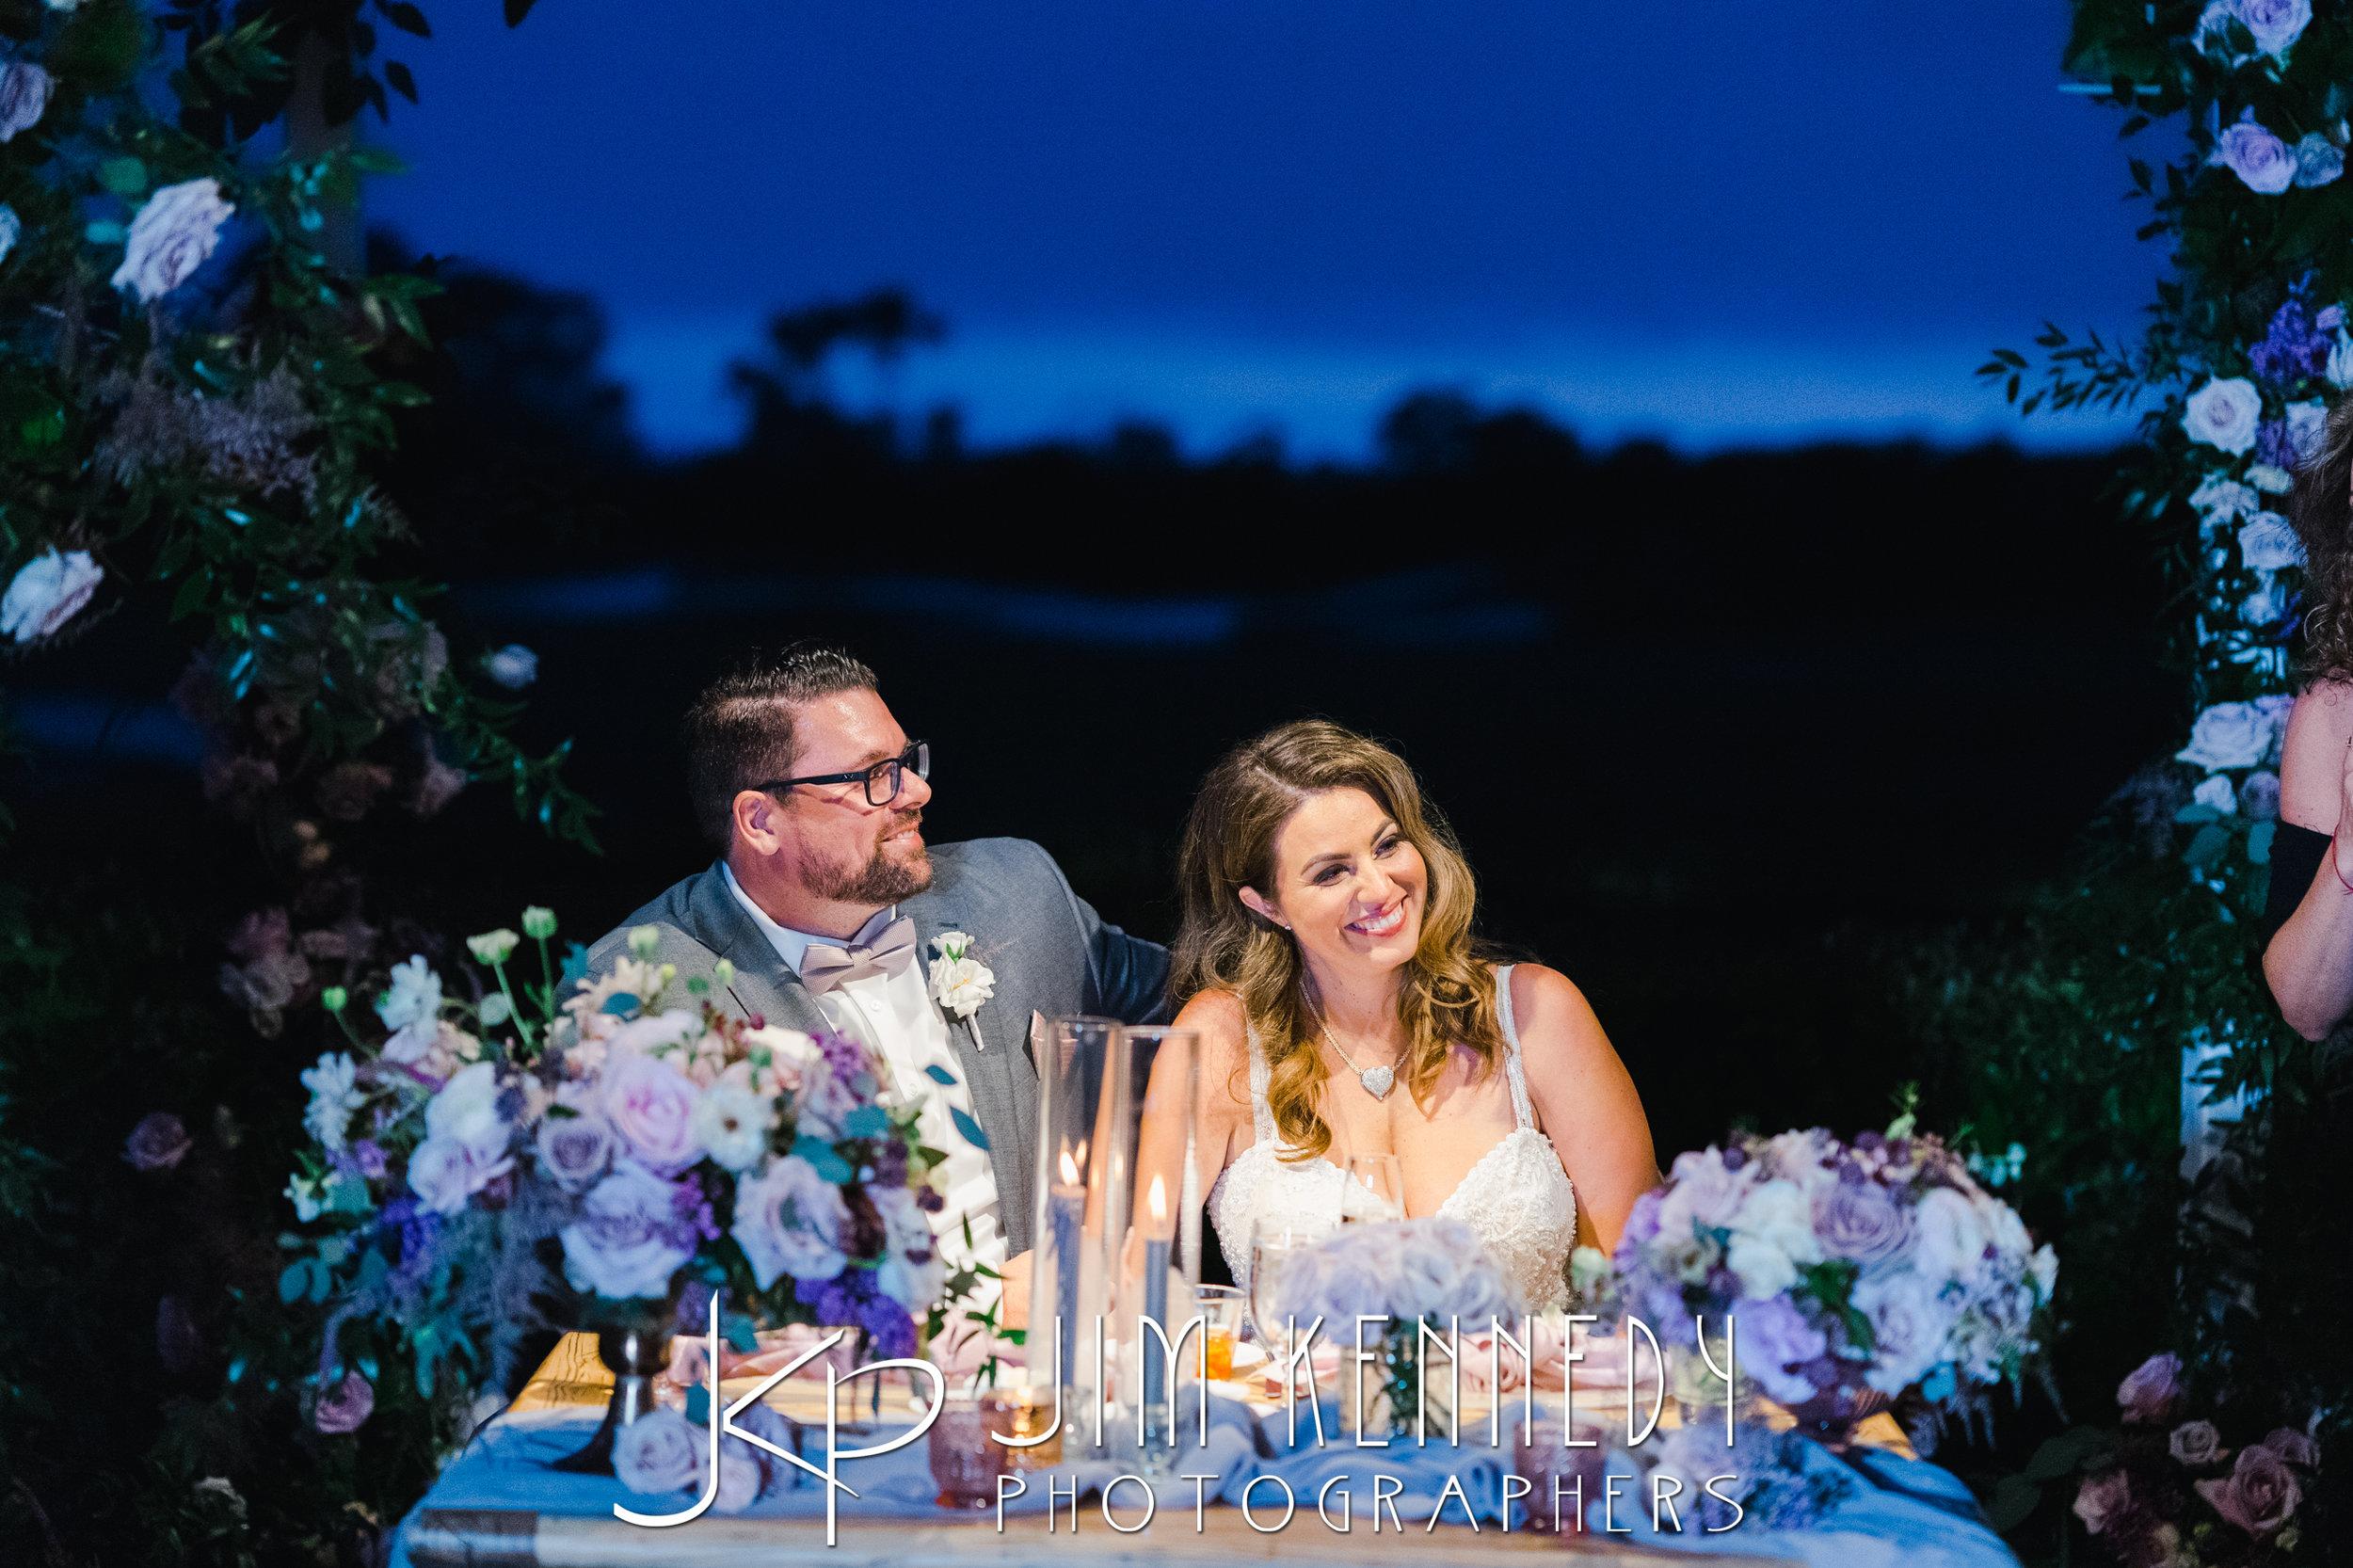 pelican-hill-wedding-jim-kenedy-photographers_0226.JPG